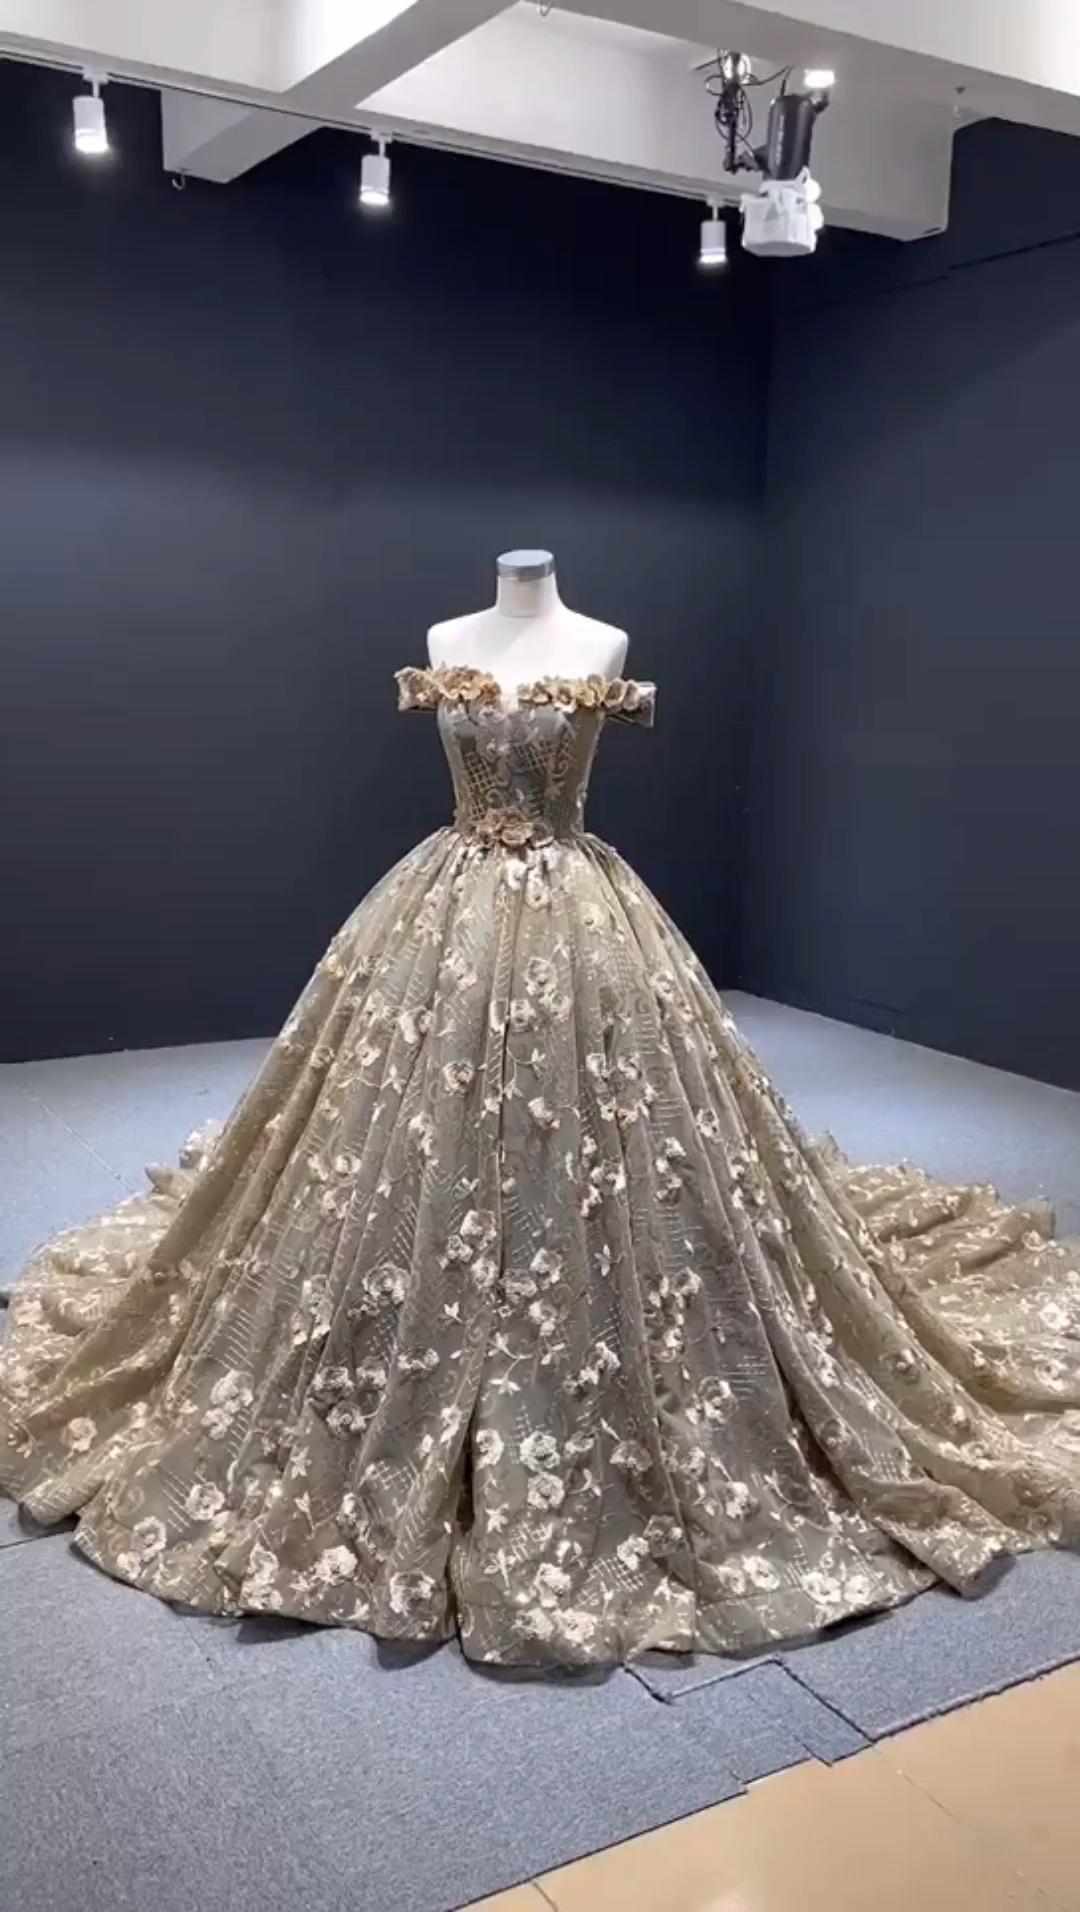 Vintage 18D lace sweet 18 dress.#sweet18dress #quinceanera